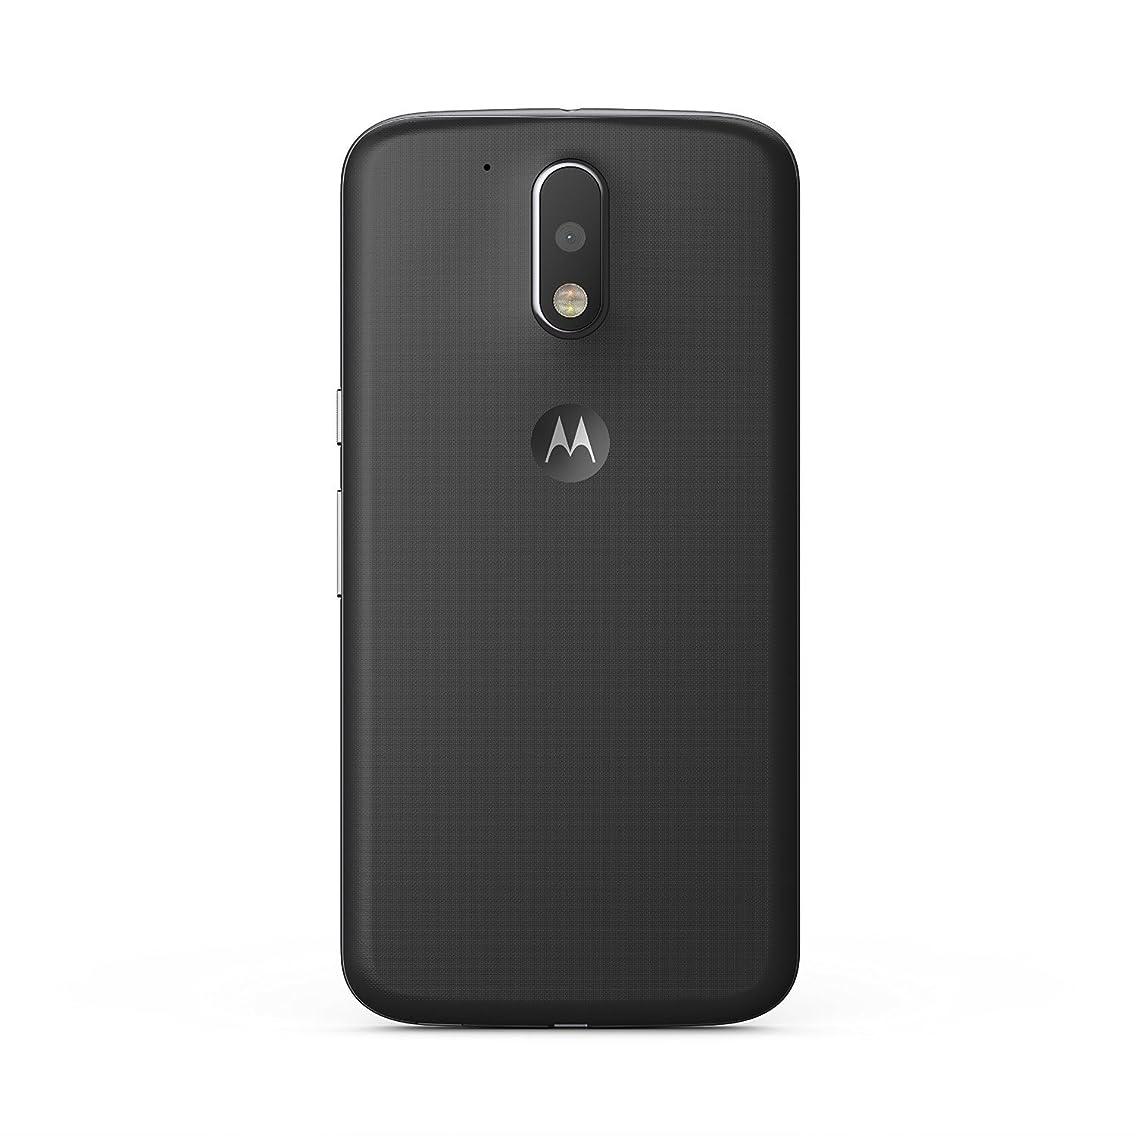 Motorola G4 16GB Smartphone